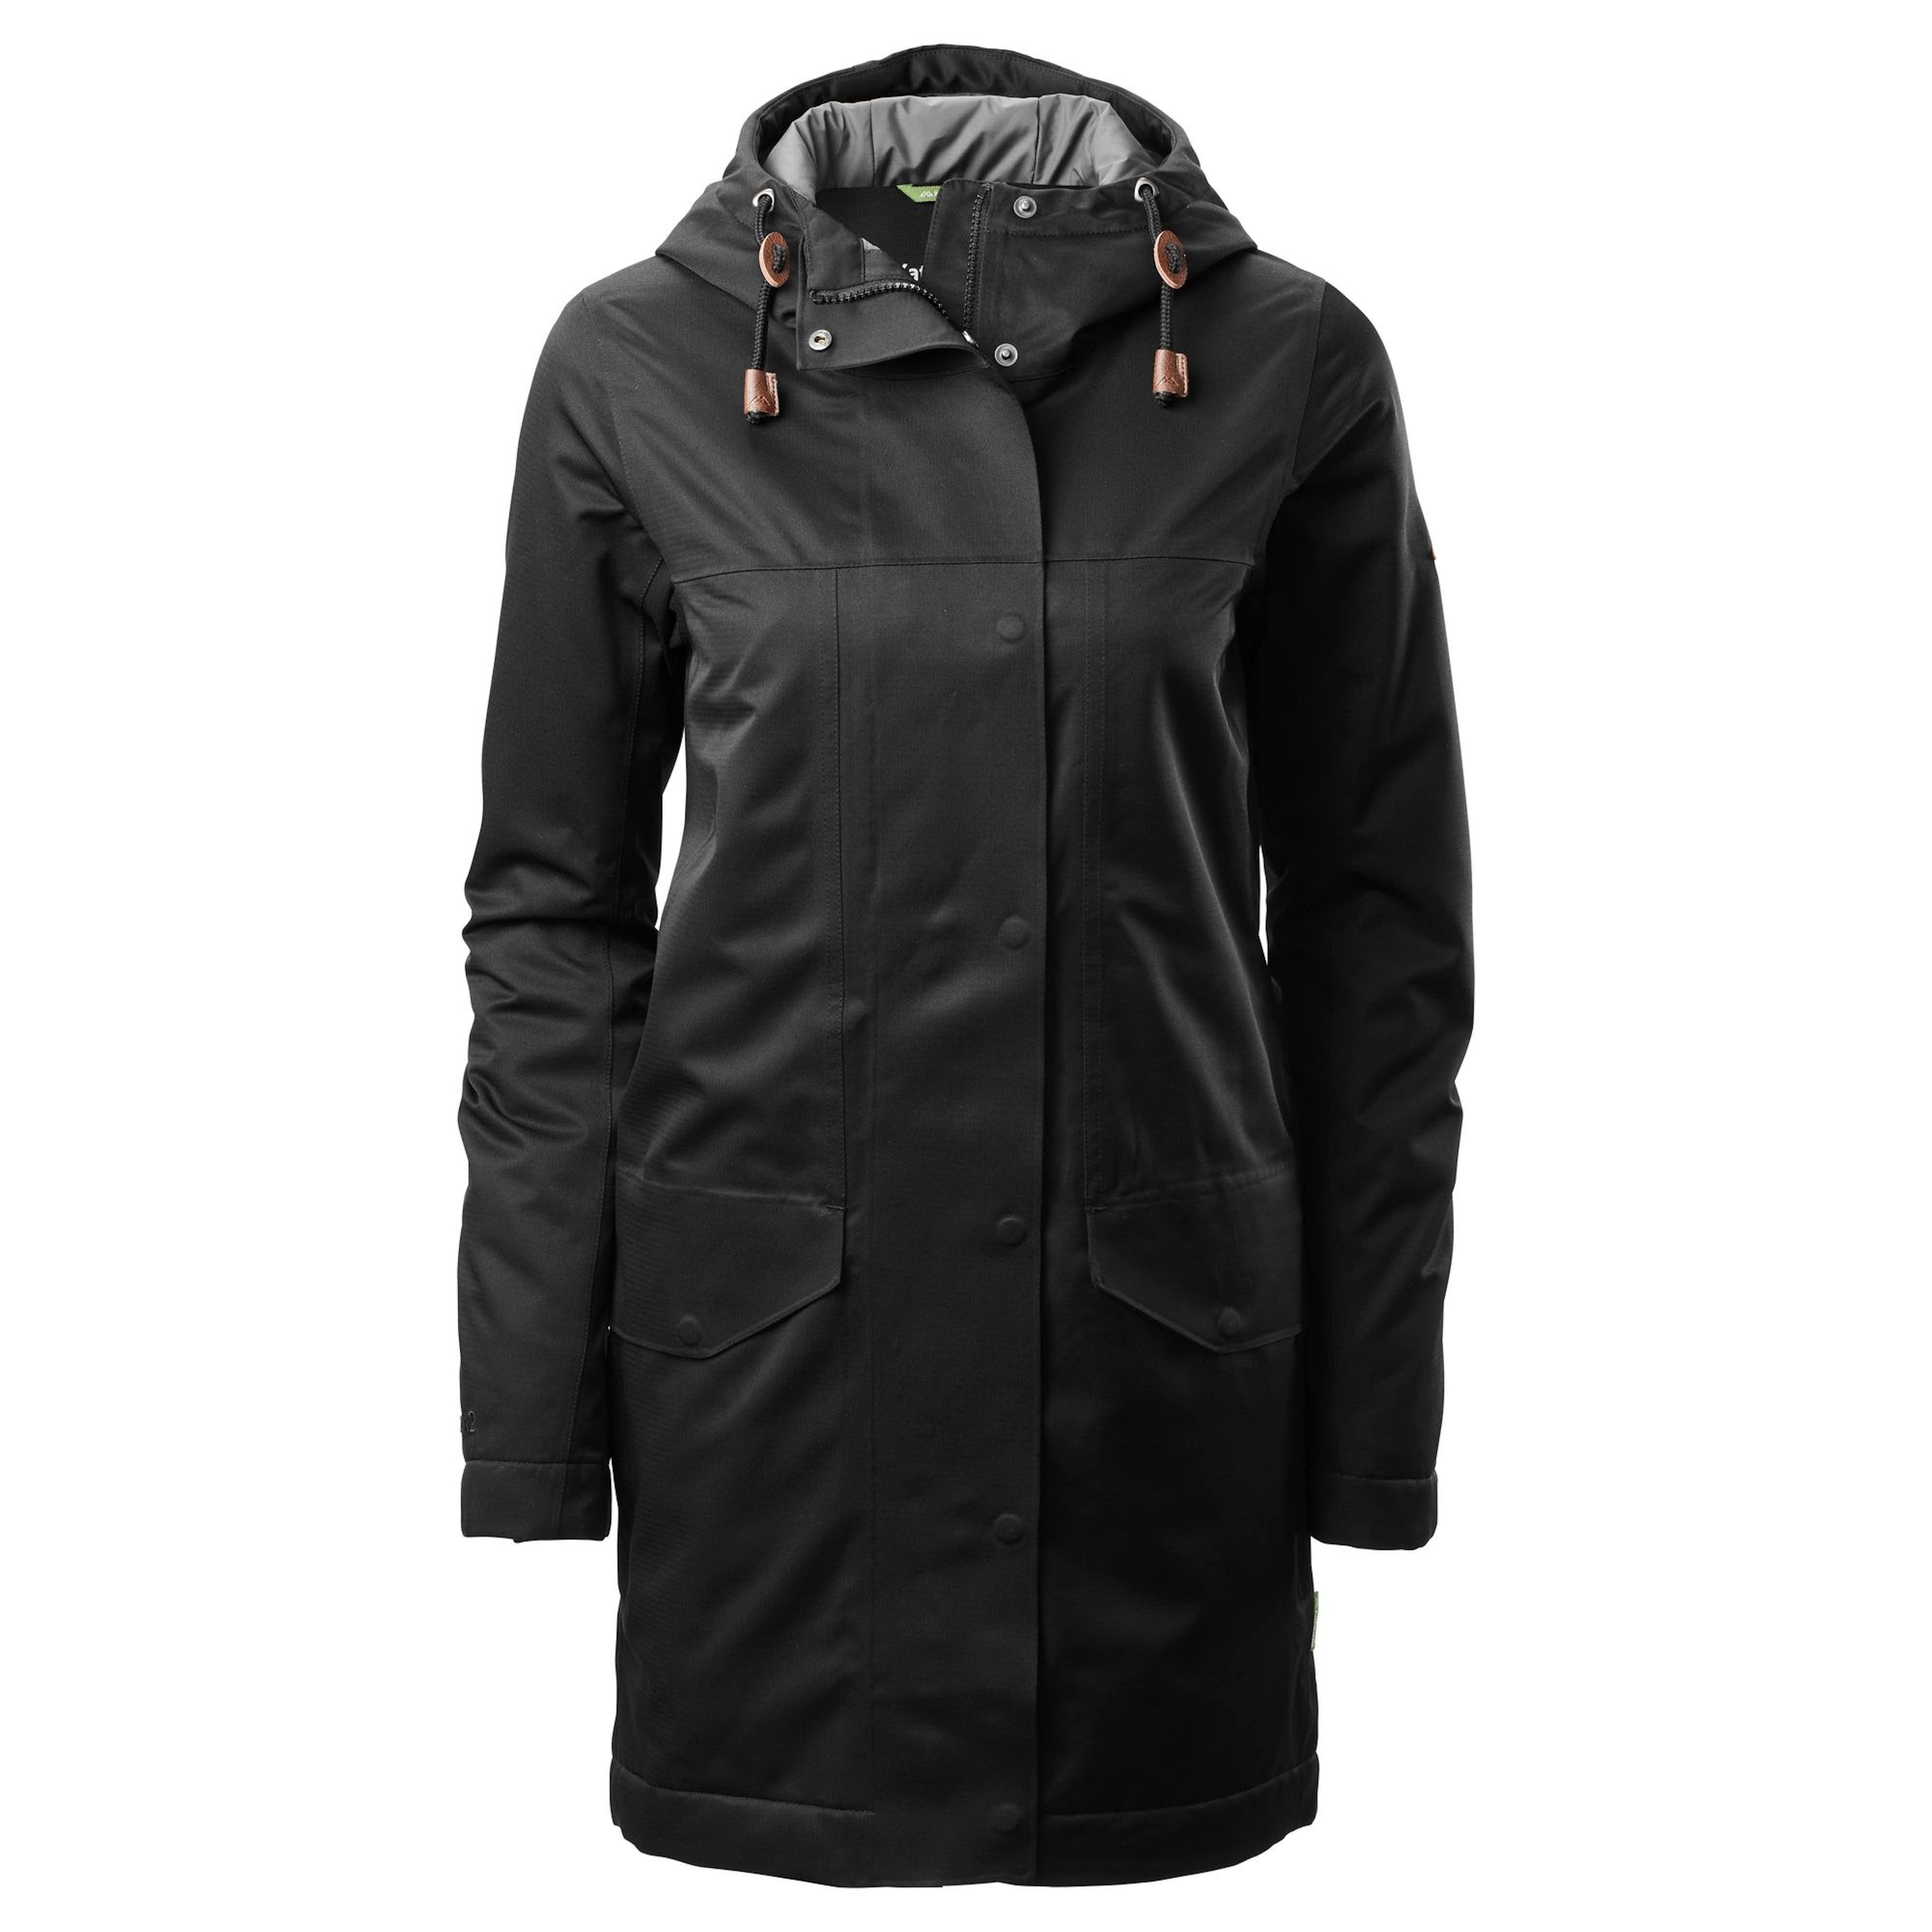 8c409e138d3 Women s Rain Jackets   Raincoats